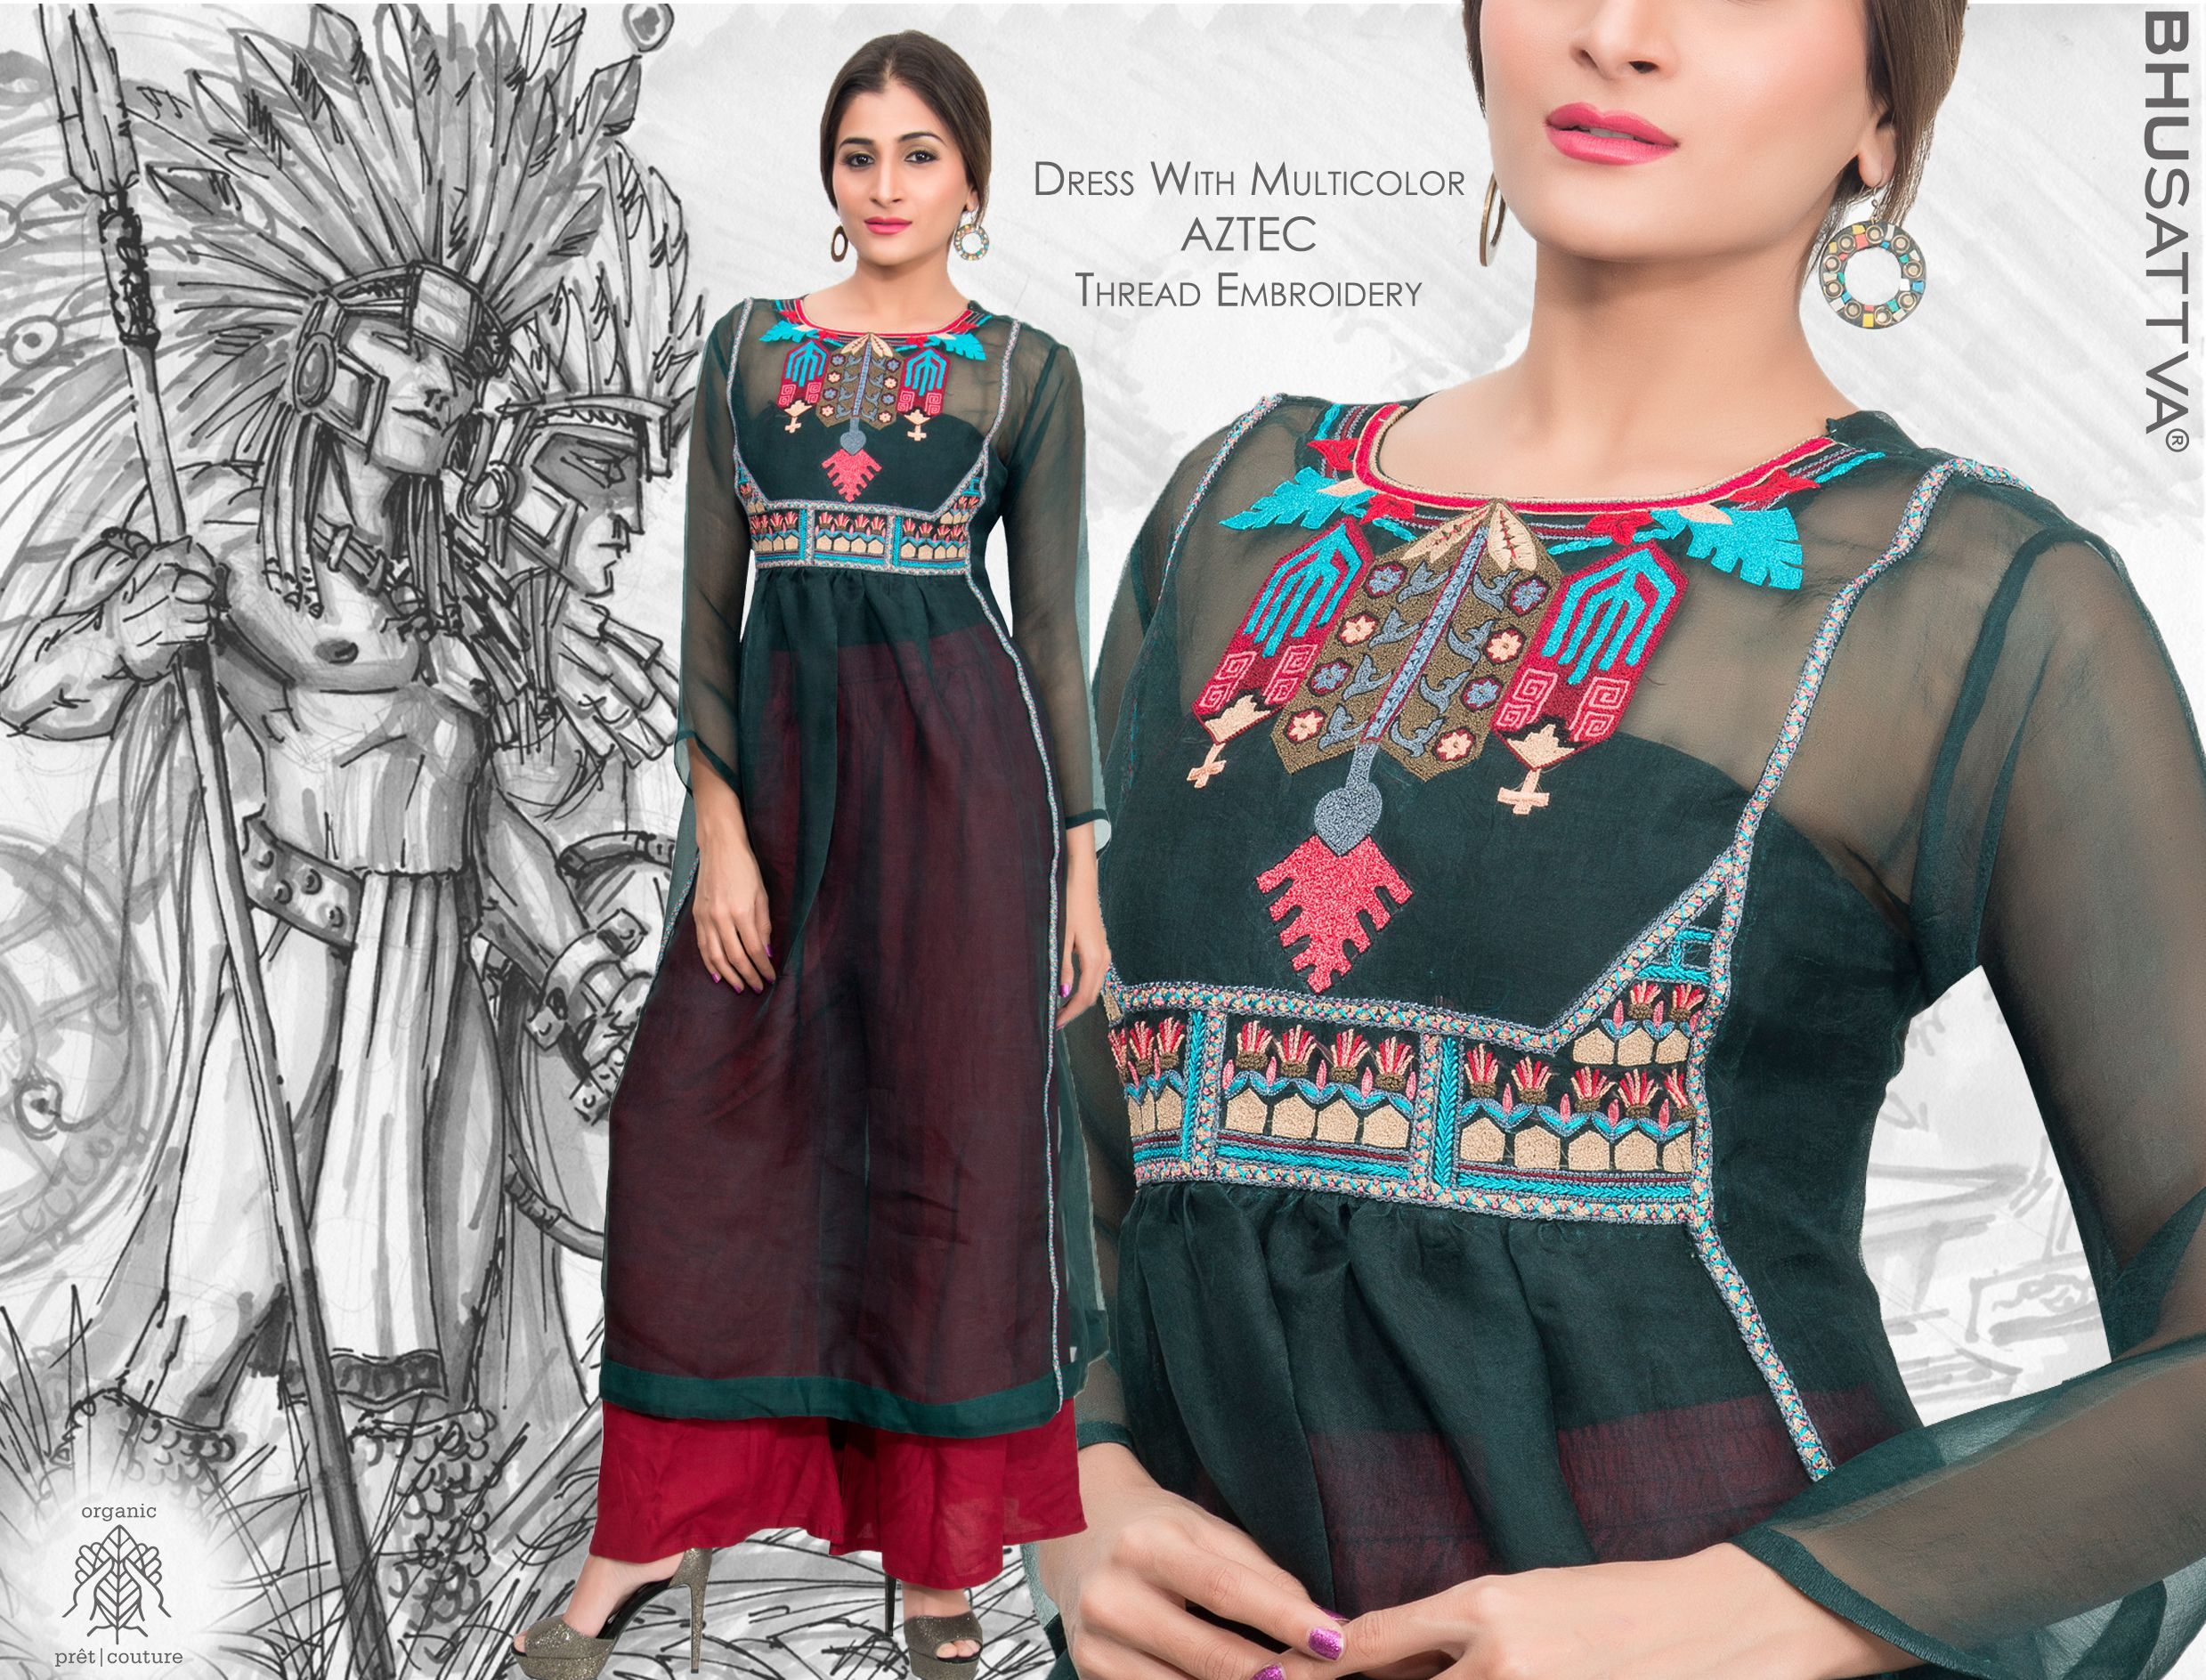 Proclaim this black dress with aztec thread embroidery from, the house of Bhusattva • • • • #Bhusattva #Organic #Pret #Couture #Sequins #Kurta #aztec #HandEmbroidered #SkinFriendly #BreatheEasy #ReflectOrganic #RevealYourself #iWearBhusattva #BelieveWhatYouWear #TrustNature #MysticalNature #CloseToNature #OrganicIdeology #OrganicCollection #NaturalDyes #EcoFashion #OrganicFashion #SustainableFashion #GoOrganic #WearOrganic #DesignerLabel #DesignerWear #EcoFriendly